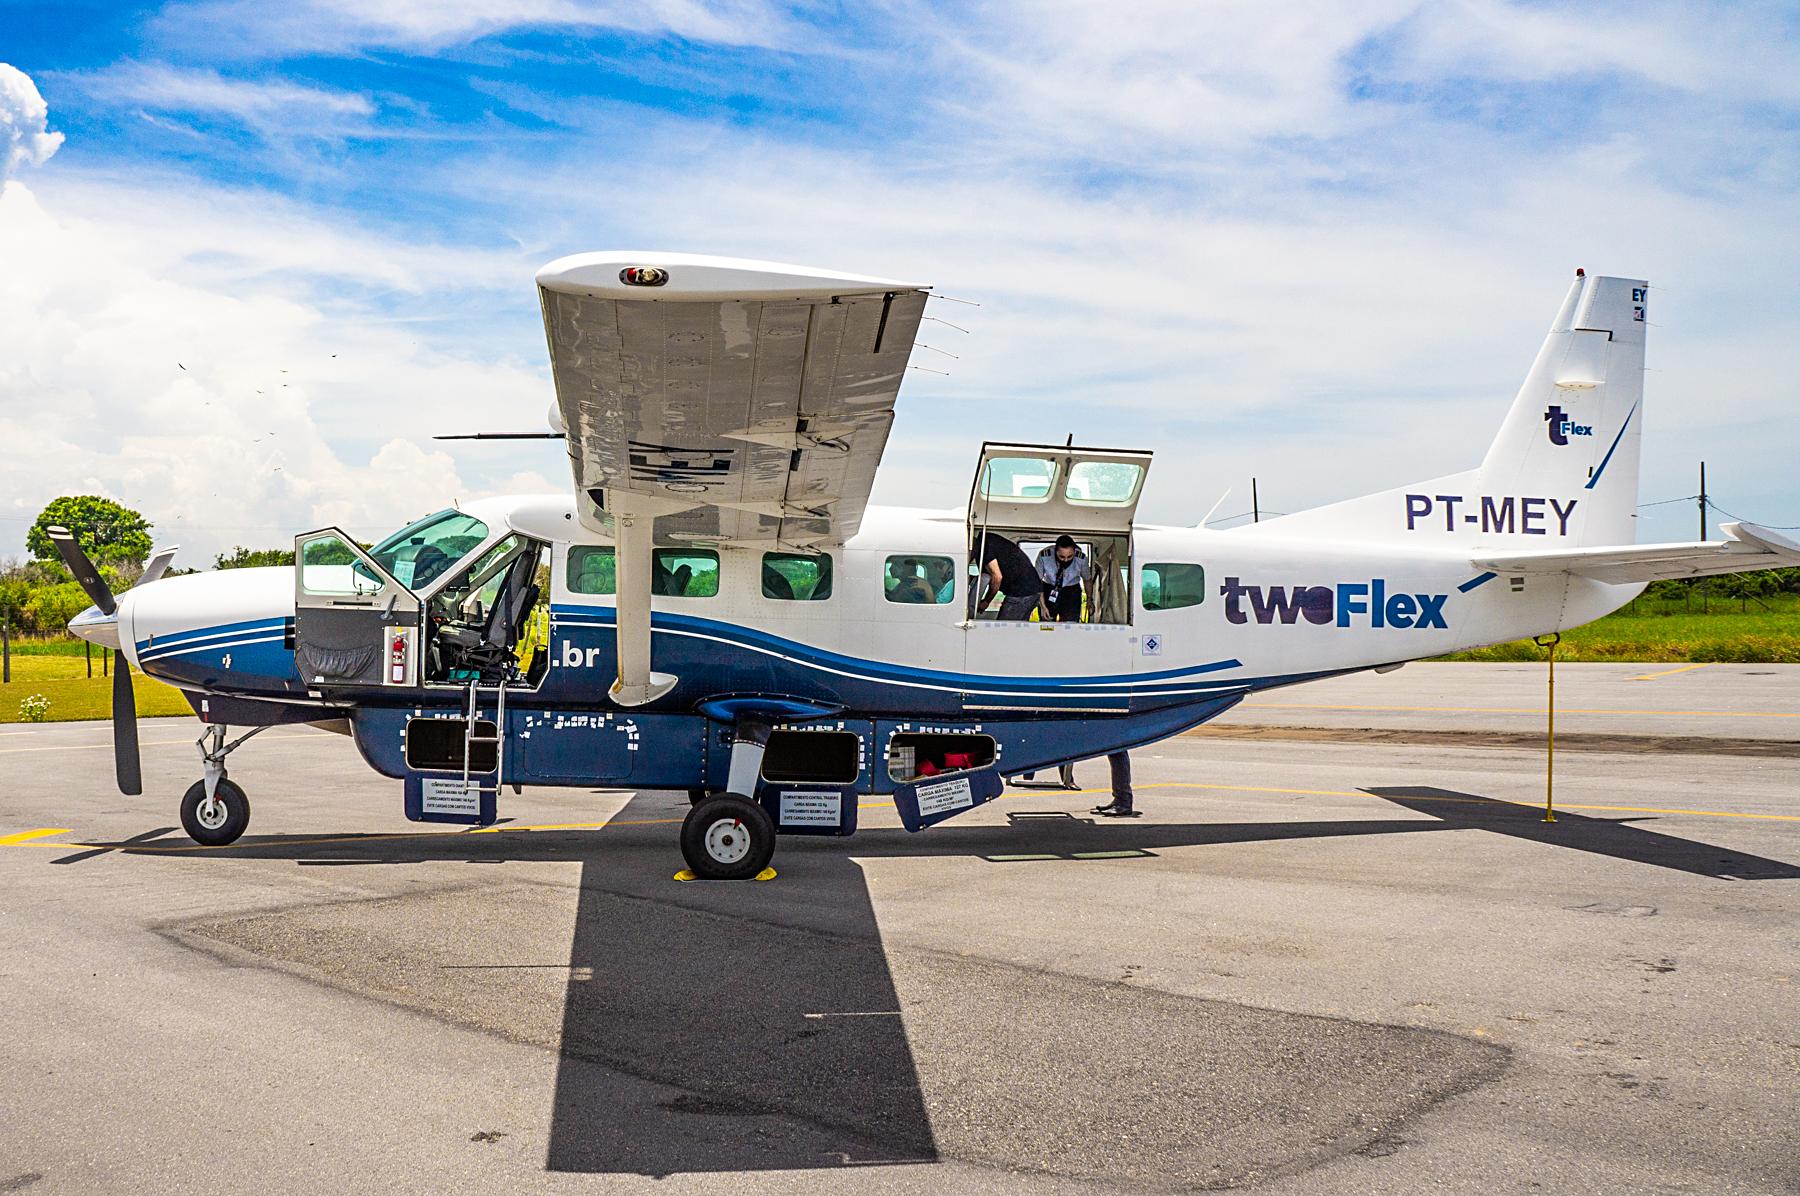 Cessna 208B Grand Caravan da Azul, ainda com pintura da TwoFlex